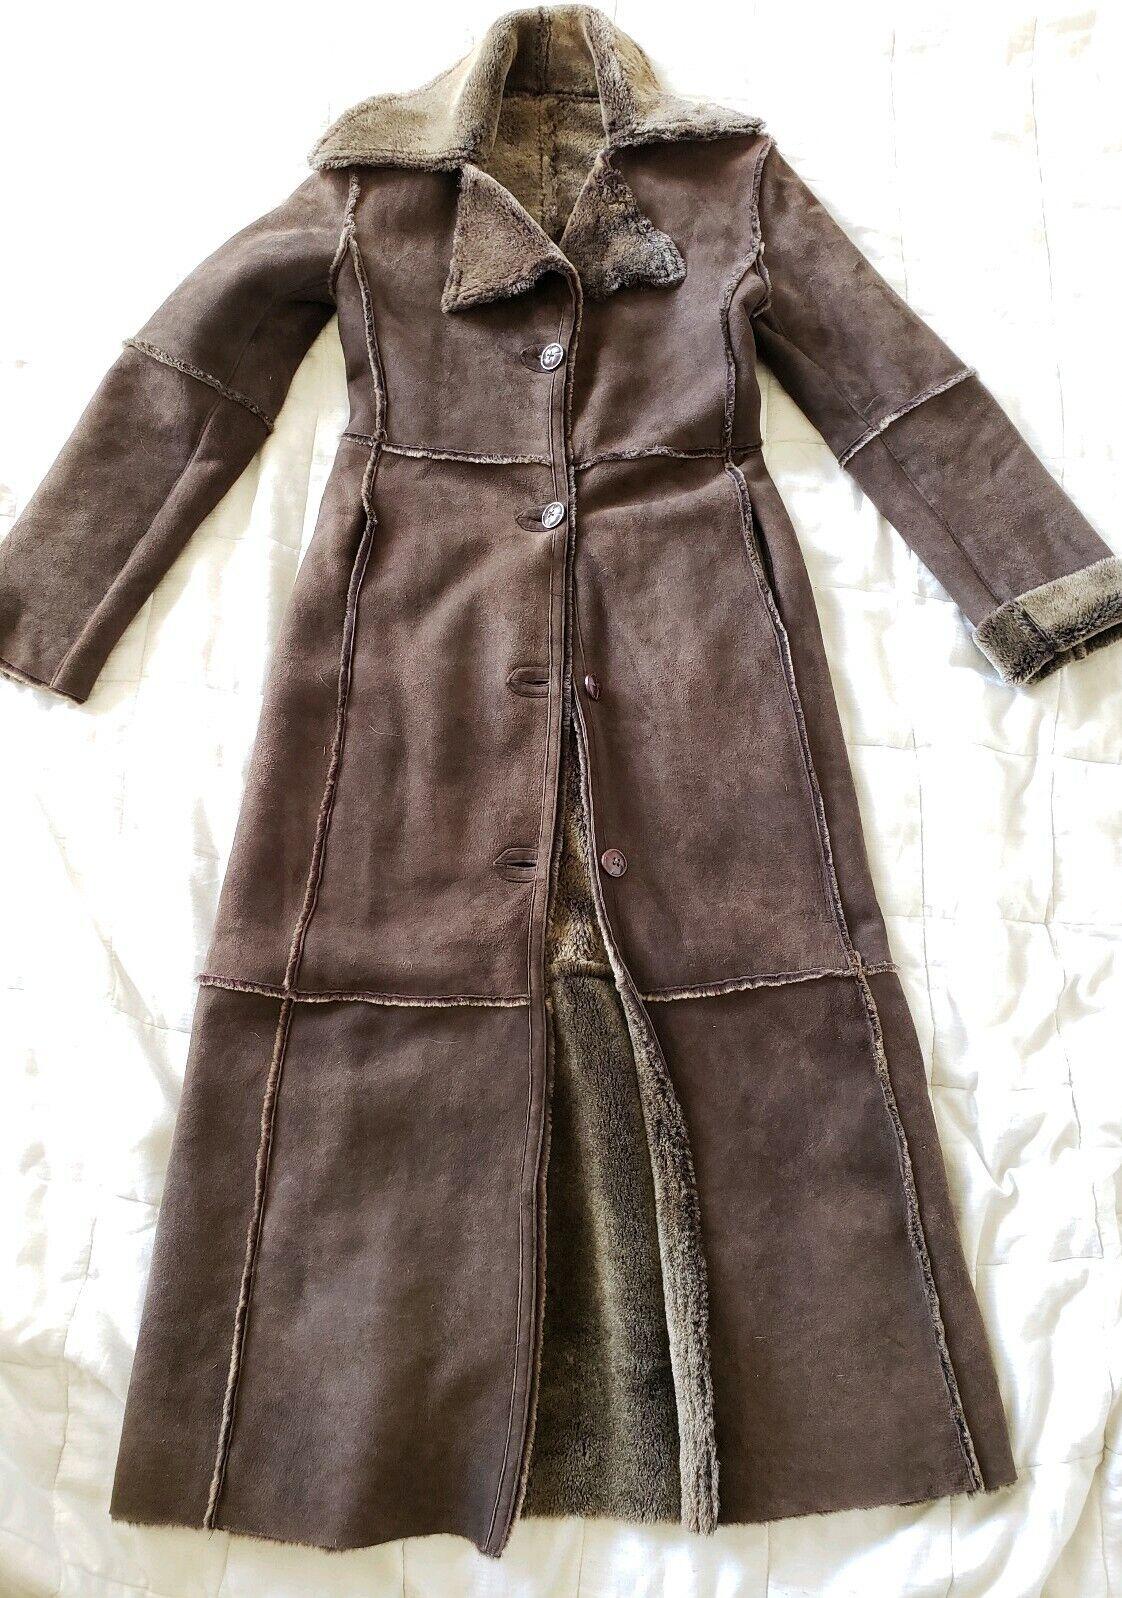 Workshop NY full length shearling coat lightweigh… - image 10